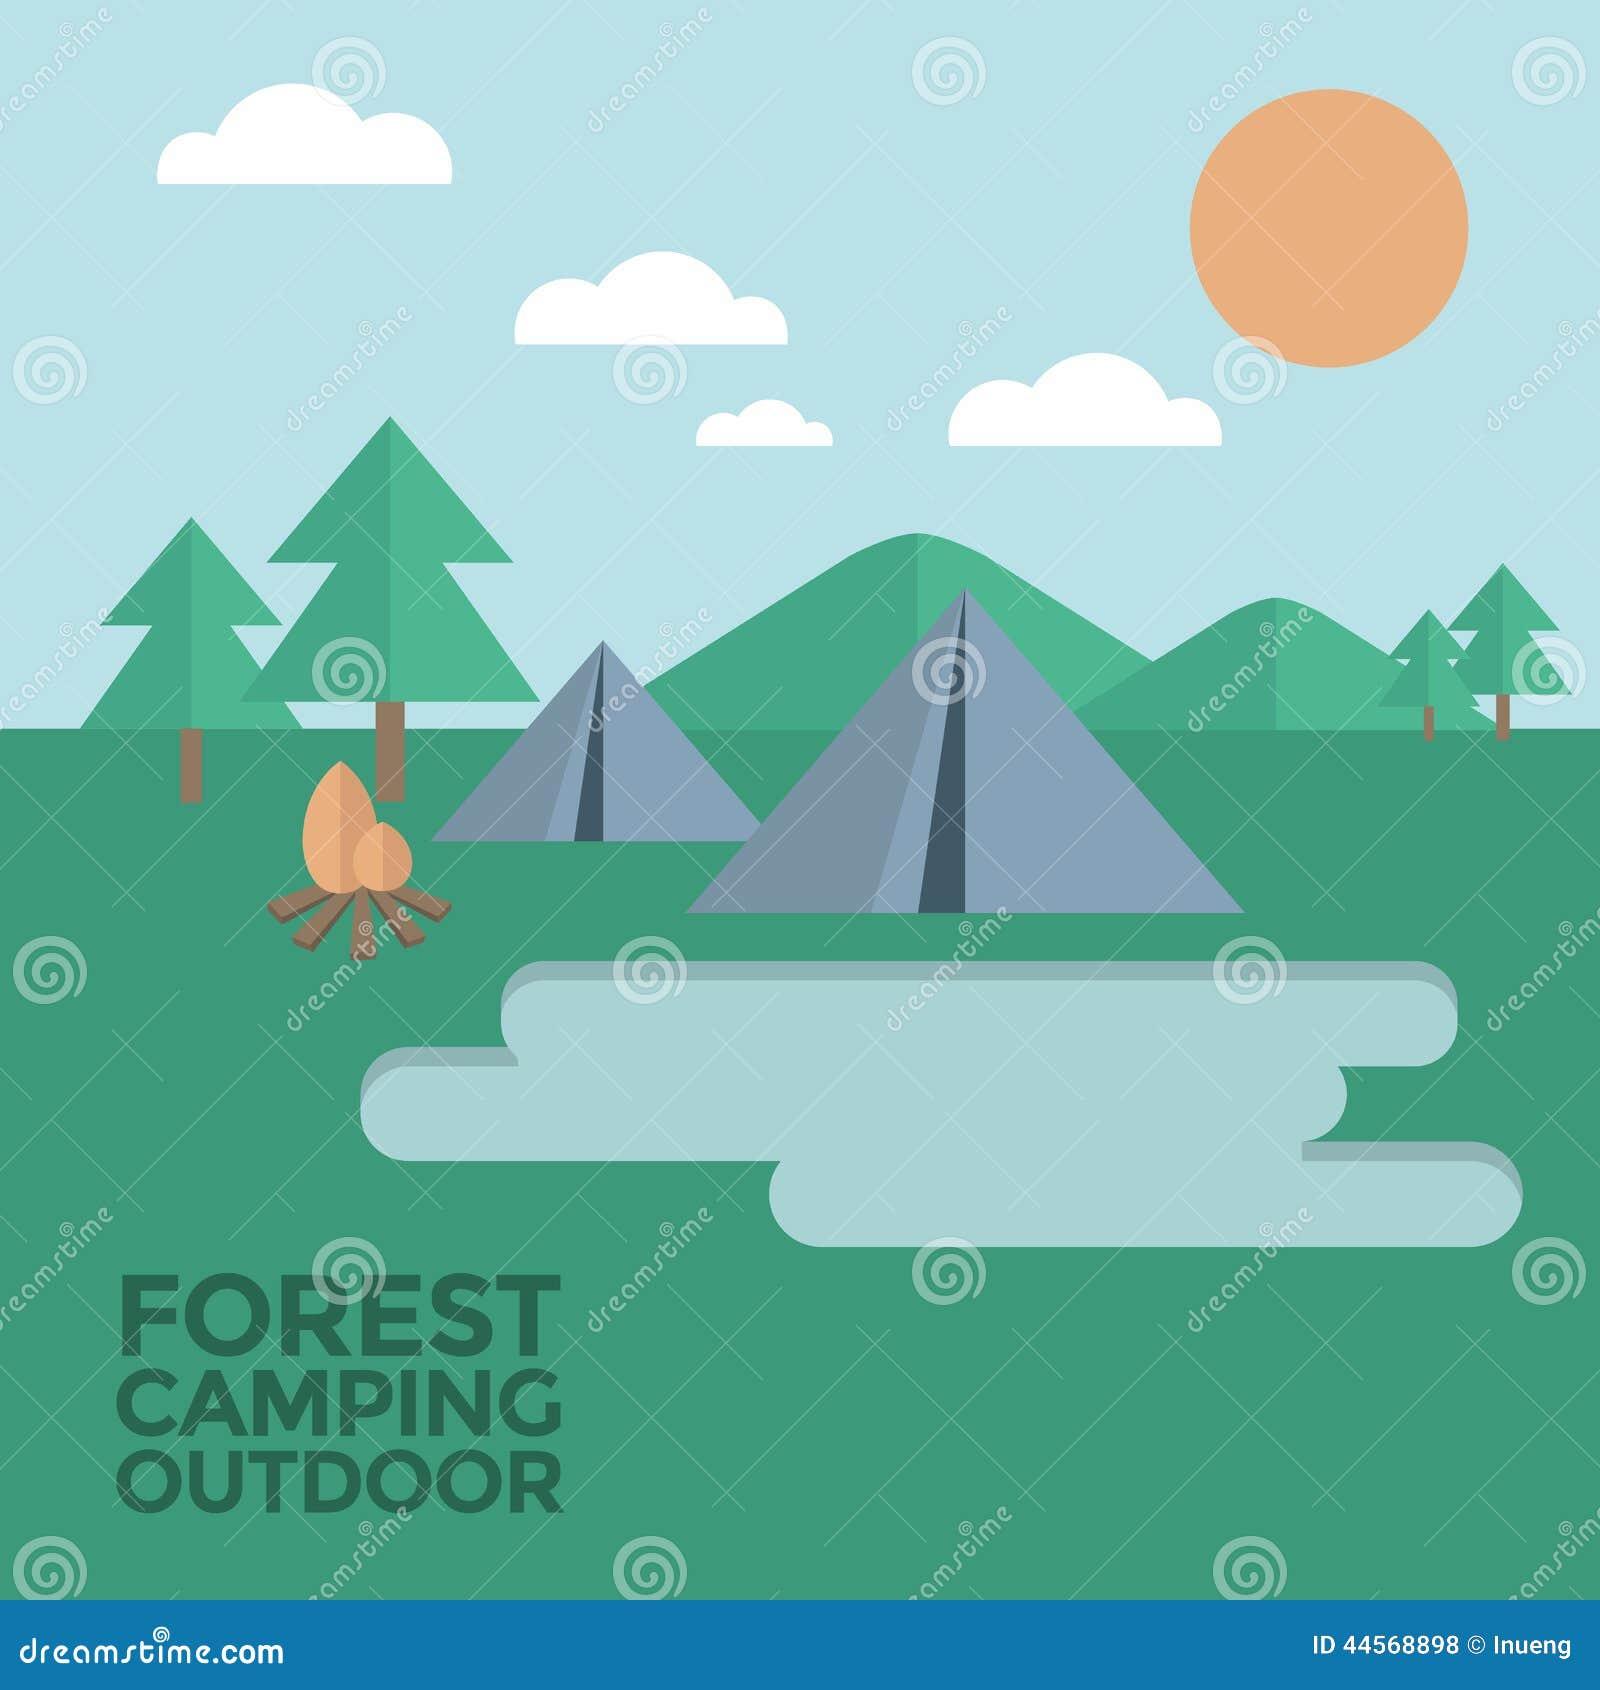 Ilustrações de Forest Camping Outdoor Vetora